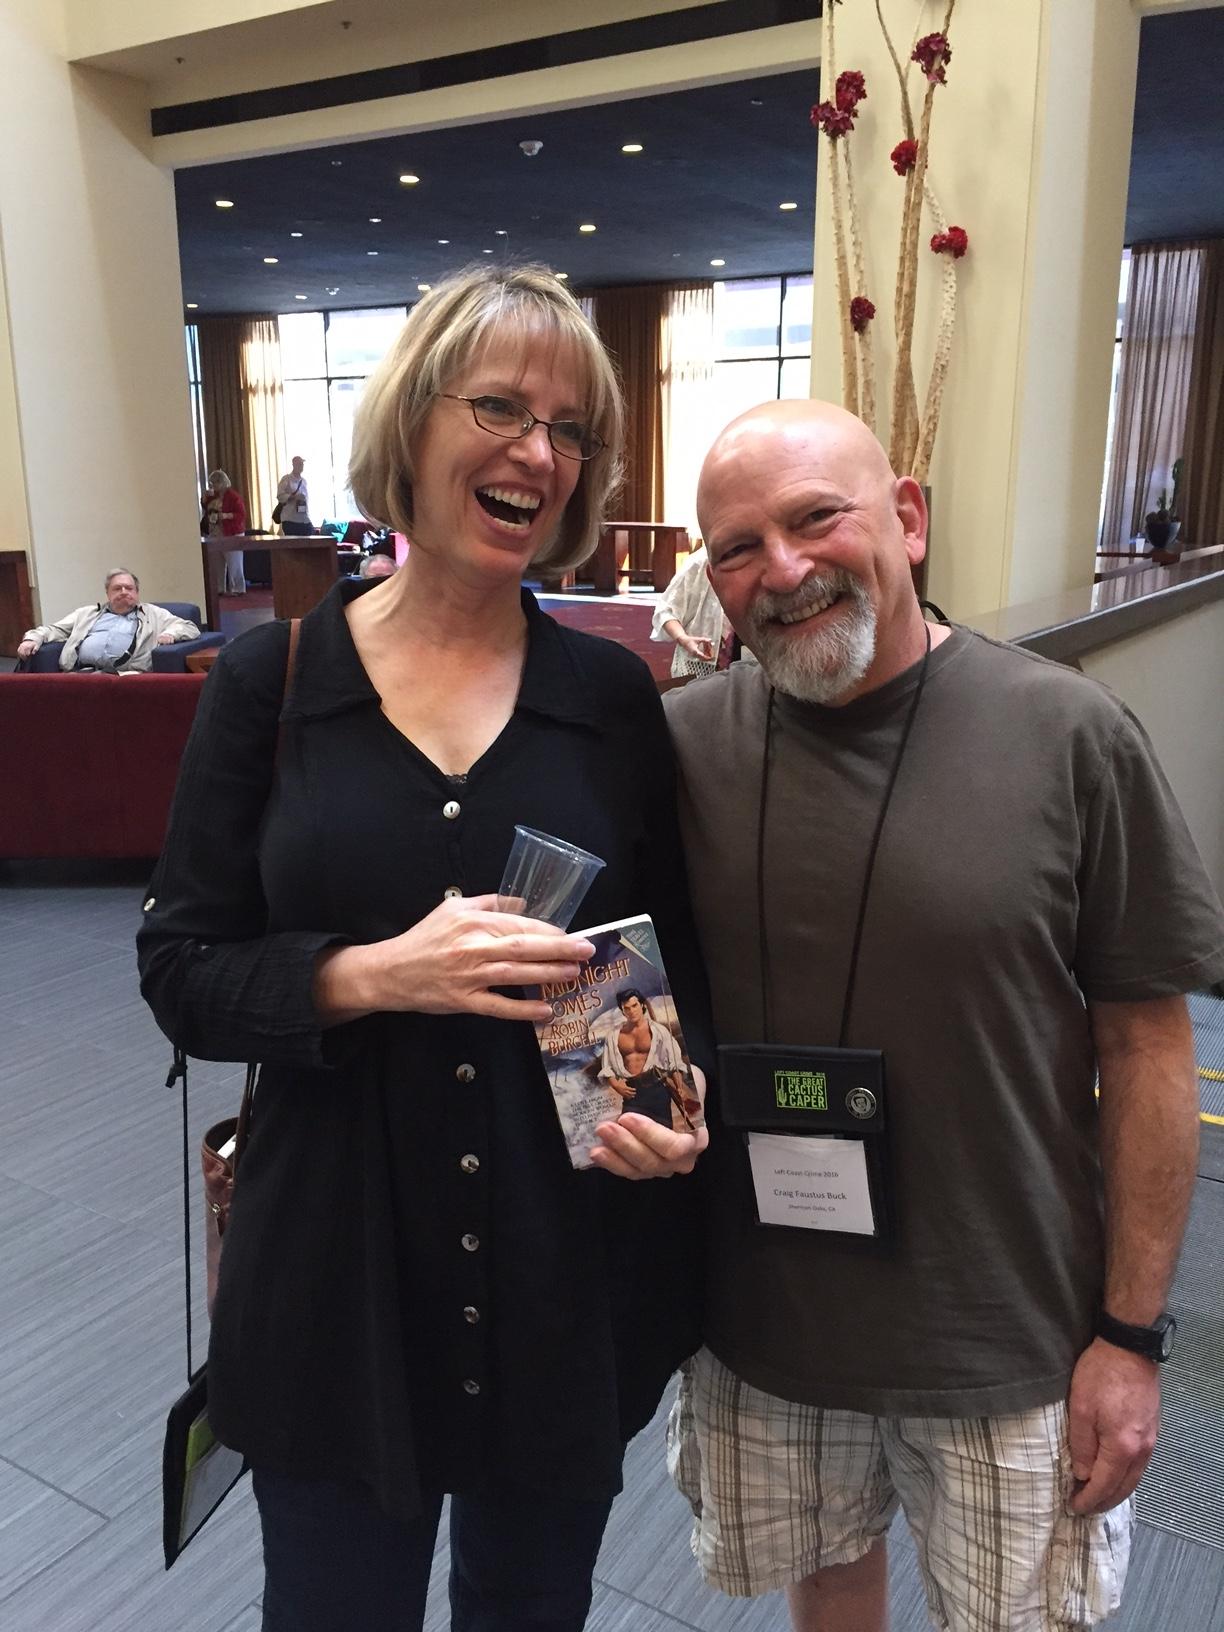 IBrash authors Robin Burcell and Craig Faustus Buck at Left Coast Crime 2016